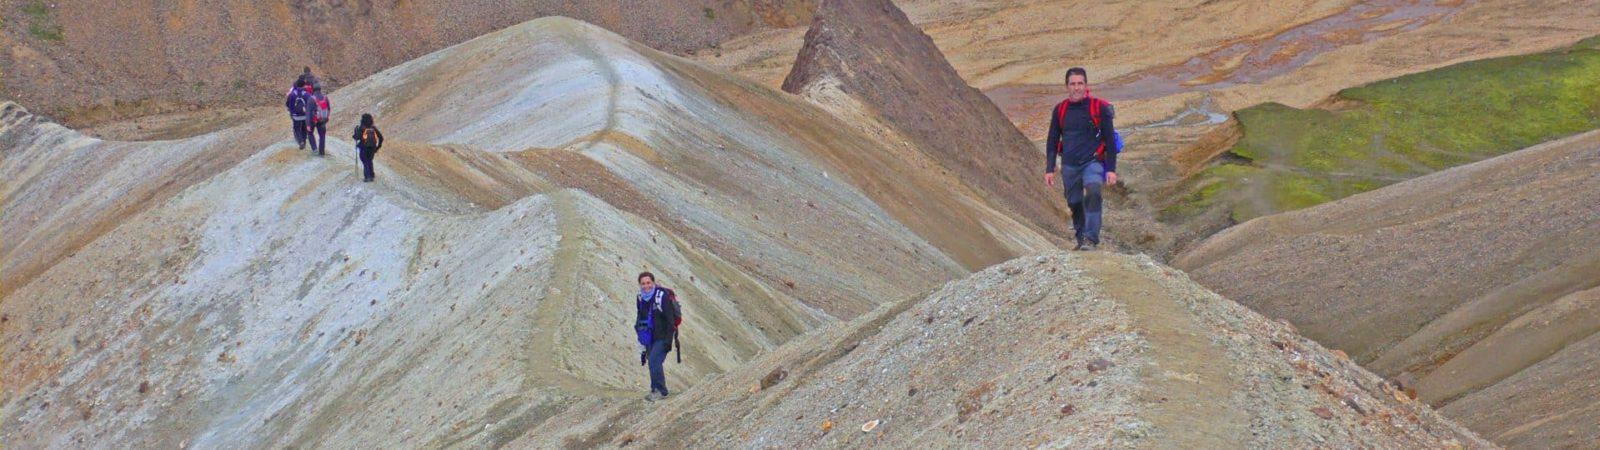 Iceland and Vestmann Islands trekking tour